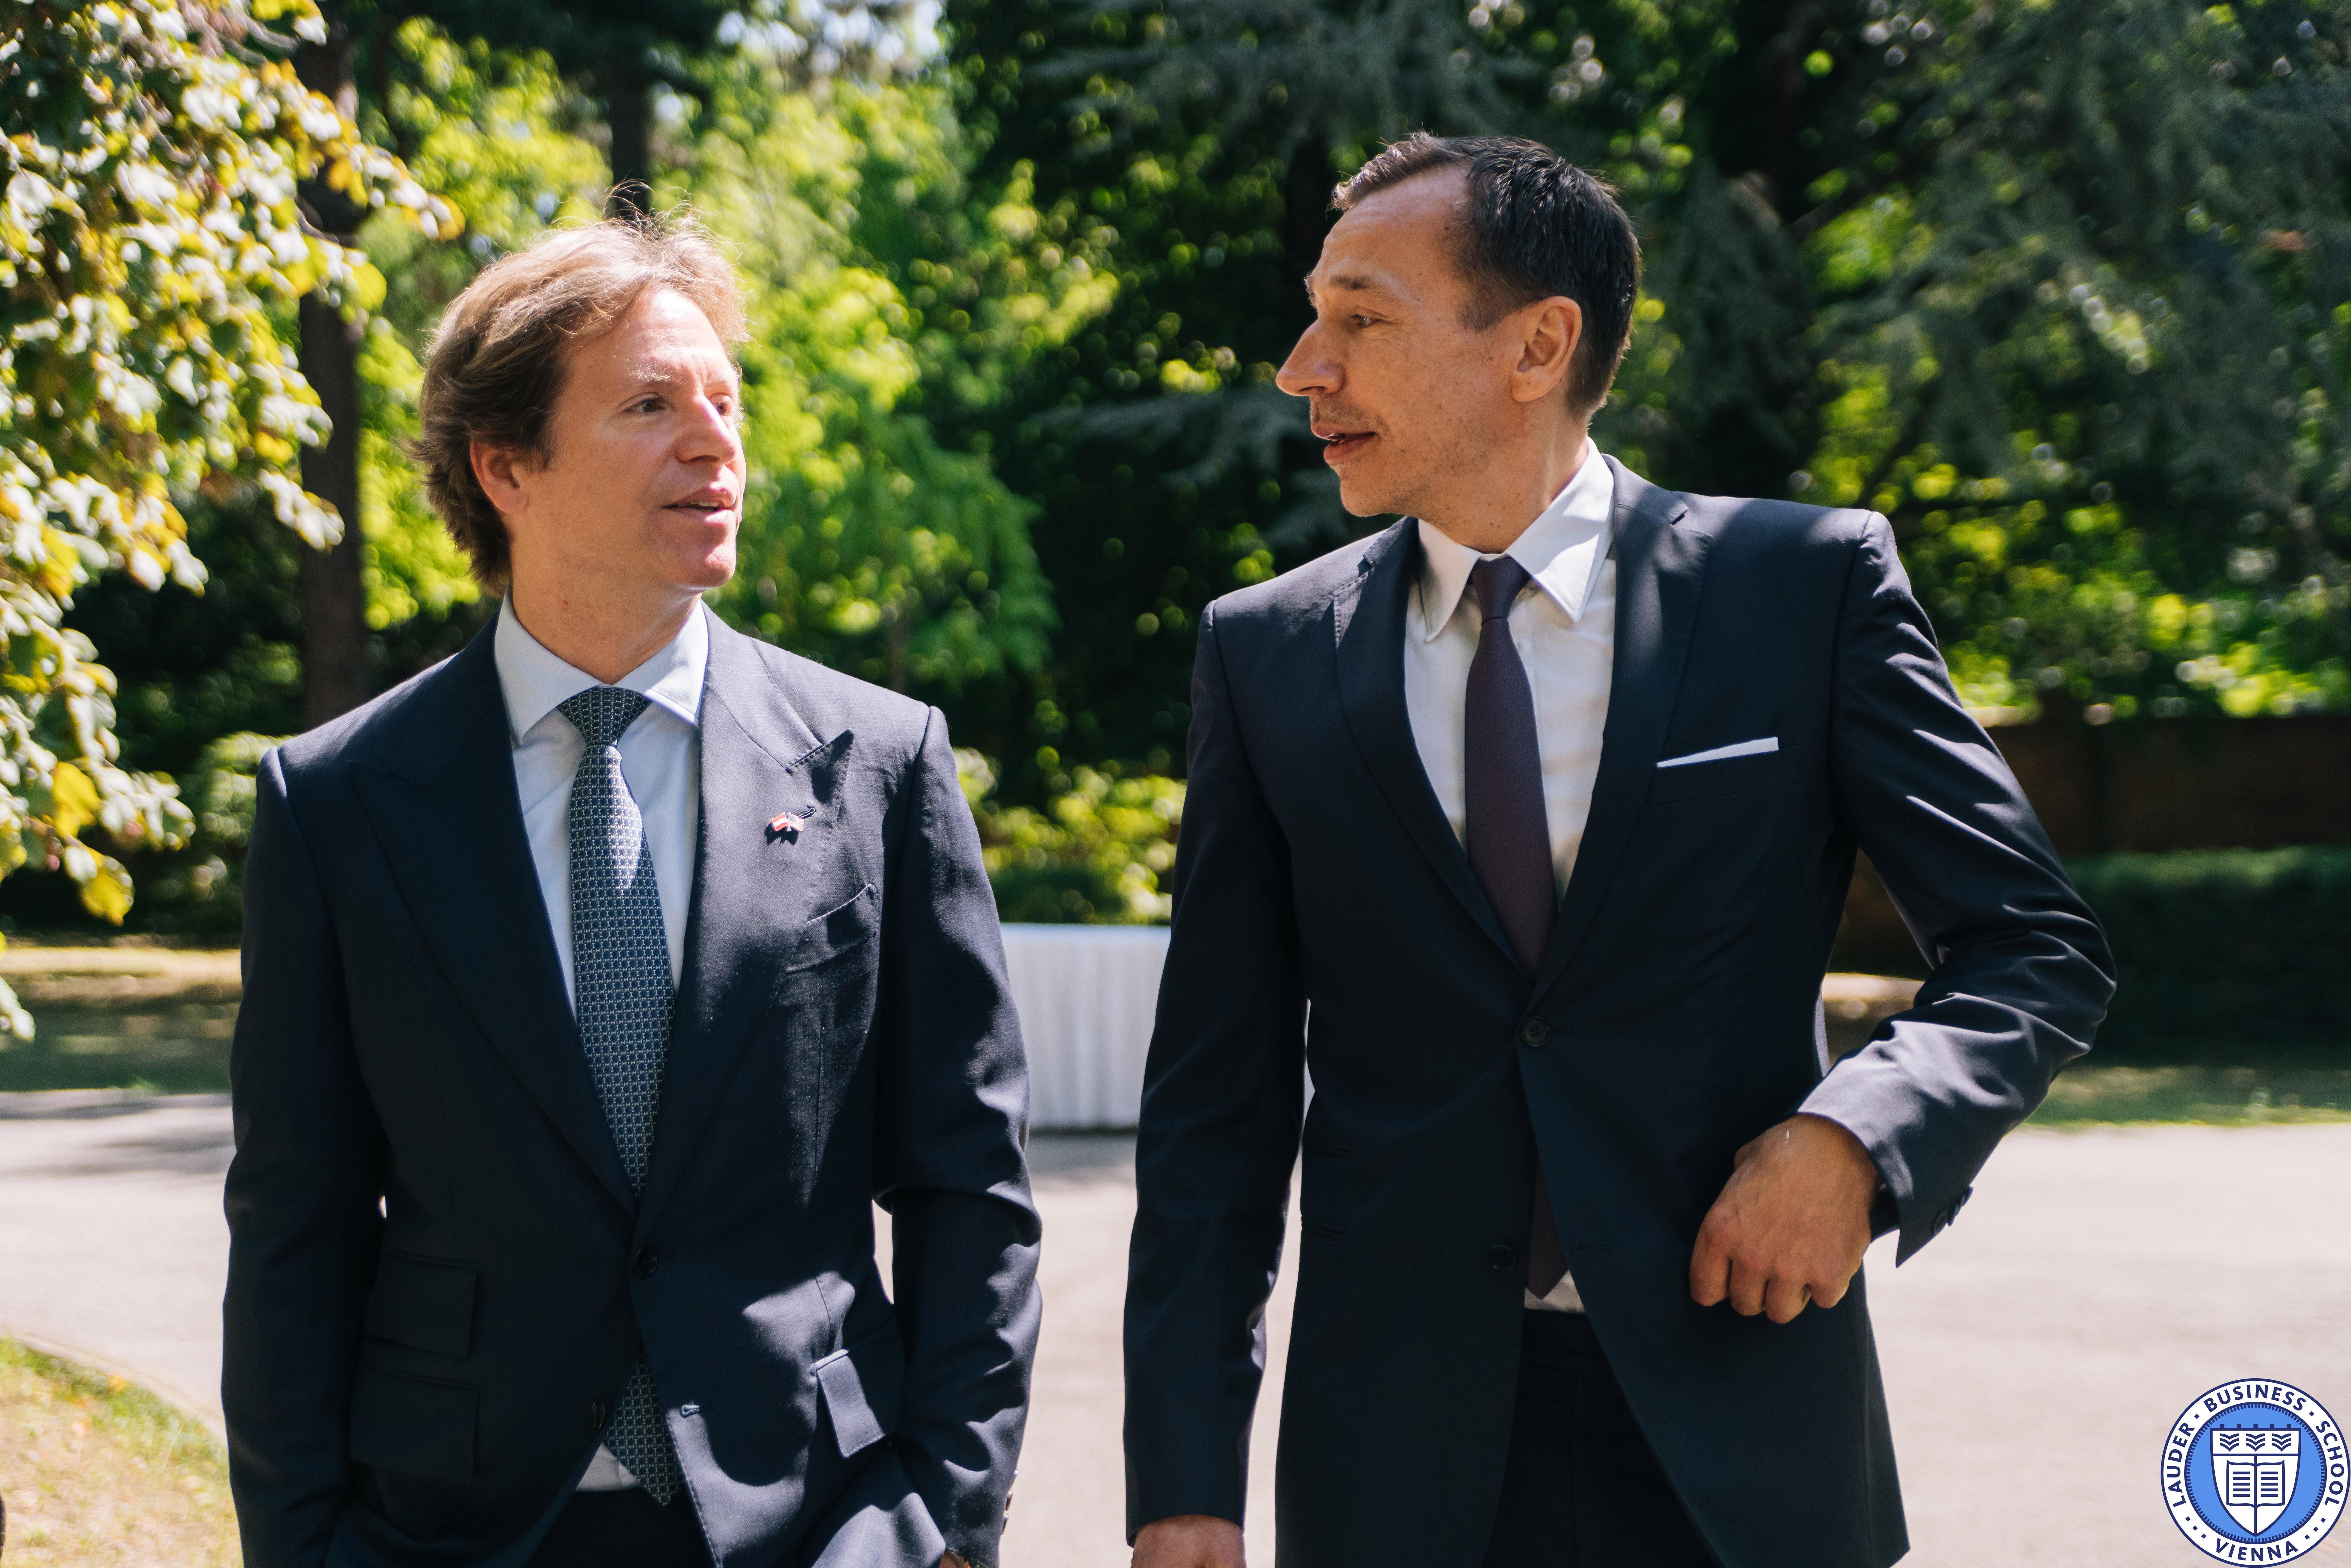 His Excellency Trevor D. Traina, US Ambassador to Austria (left), LBS Executive Director Mr. Alexander Zirkler (right)